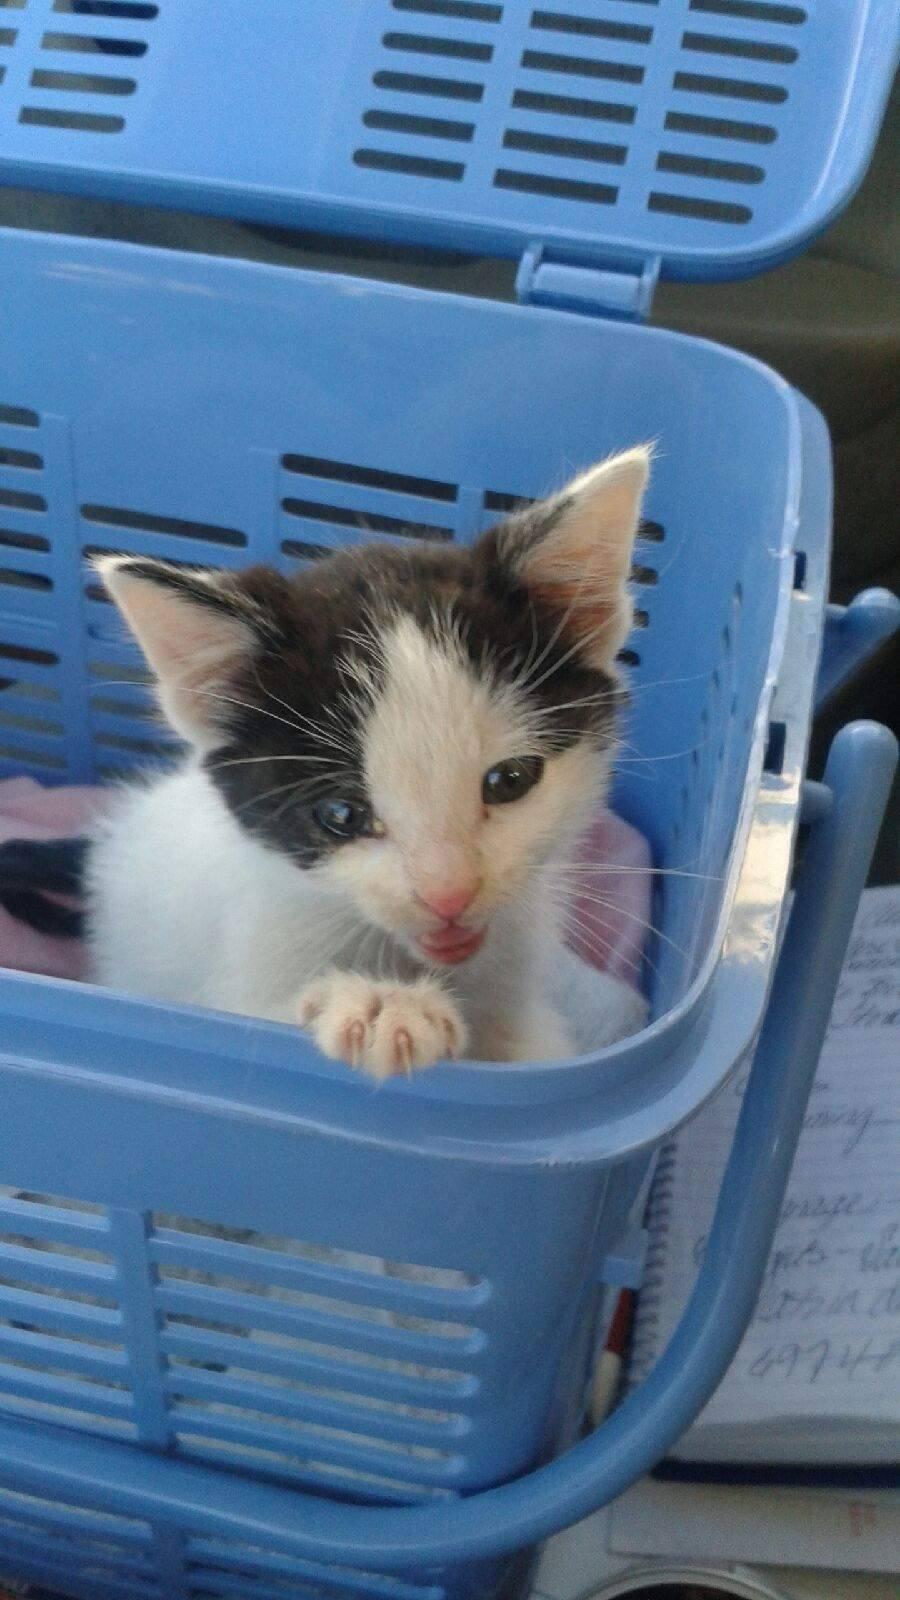 Free Kittens Kansas City Area : kittens, kansas, Adoption, Another, Chance, Rescue,, Kansas, City,, Petfinder